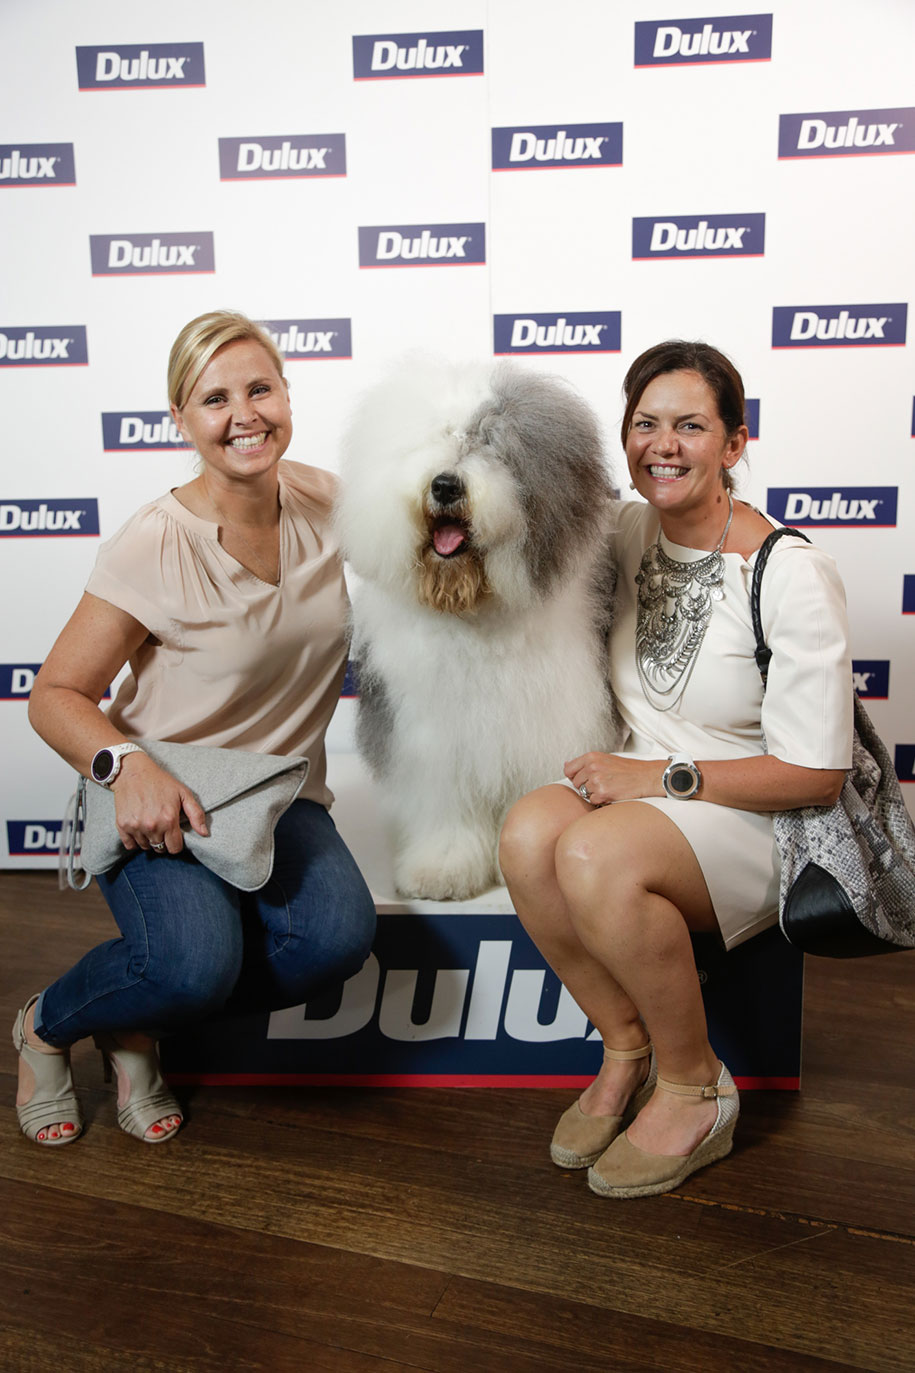 2016-Dulux-Colour-Launch-Sydney-©-SaltyDingo-2016-11575